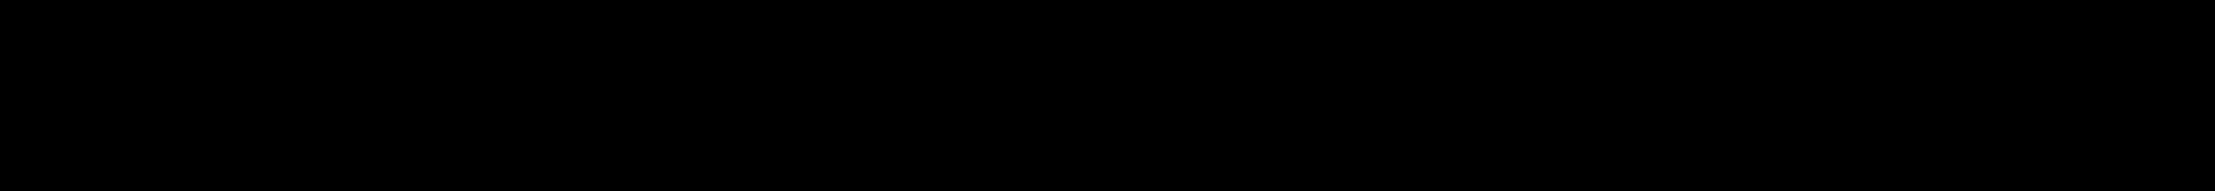 Ritafurey A Medium Italic